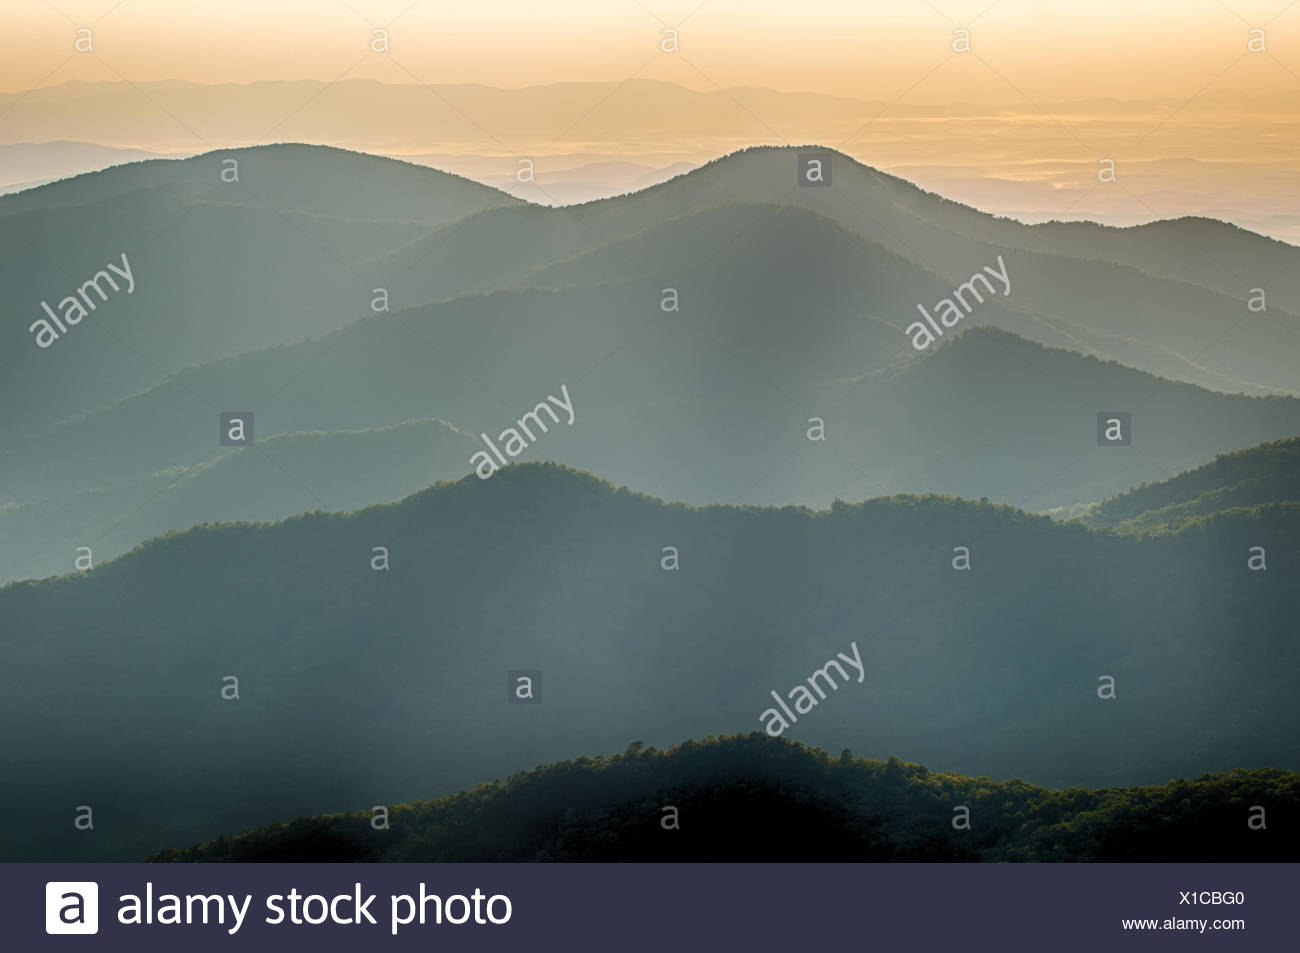 The simple layers of the Smokies at sunset - Smoky Mountain Nat. Park, USA. - Stock Image